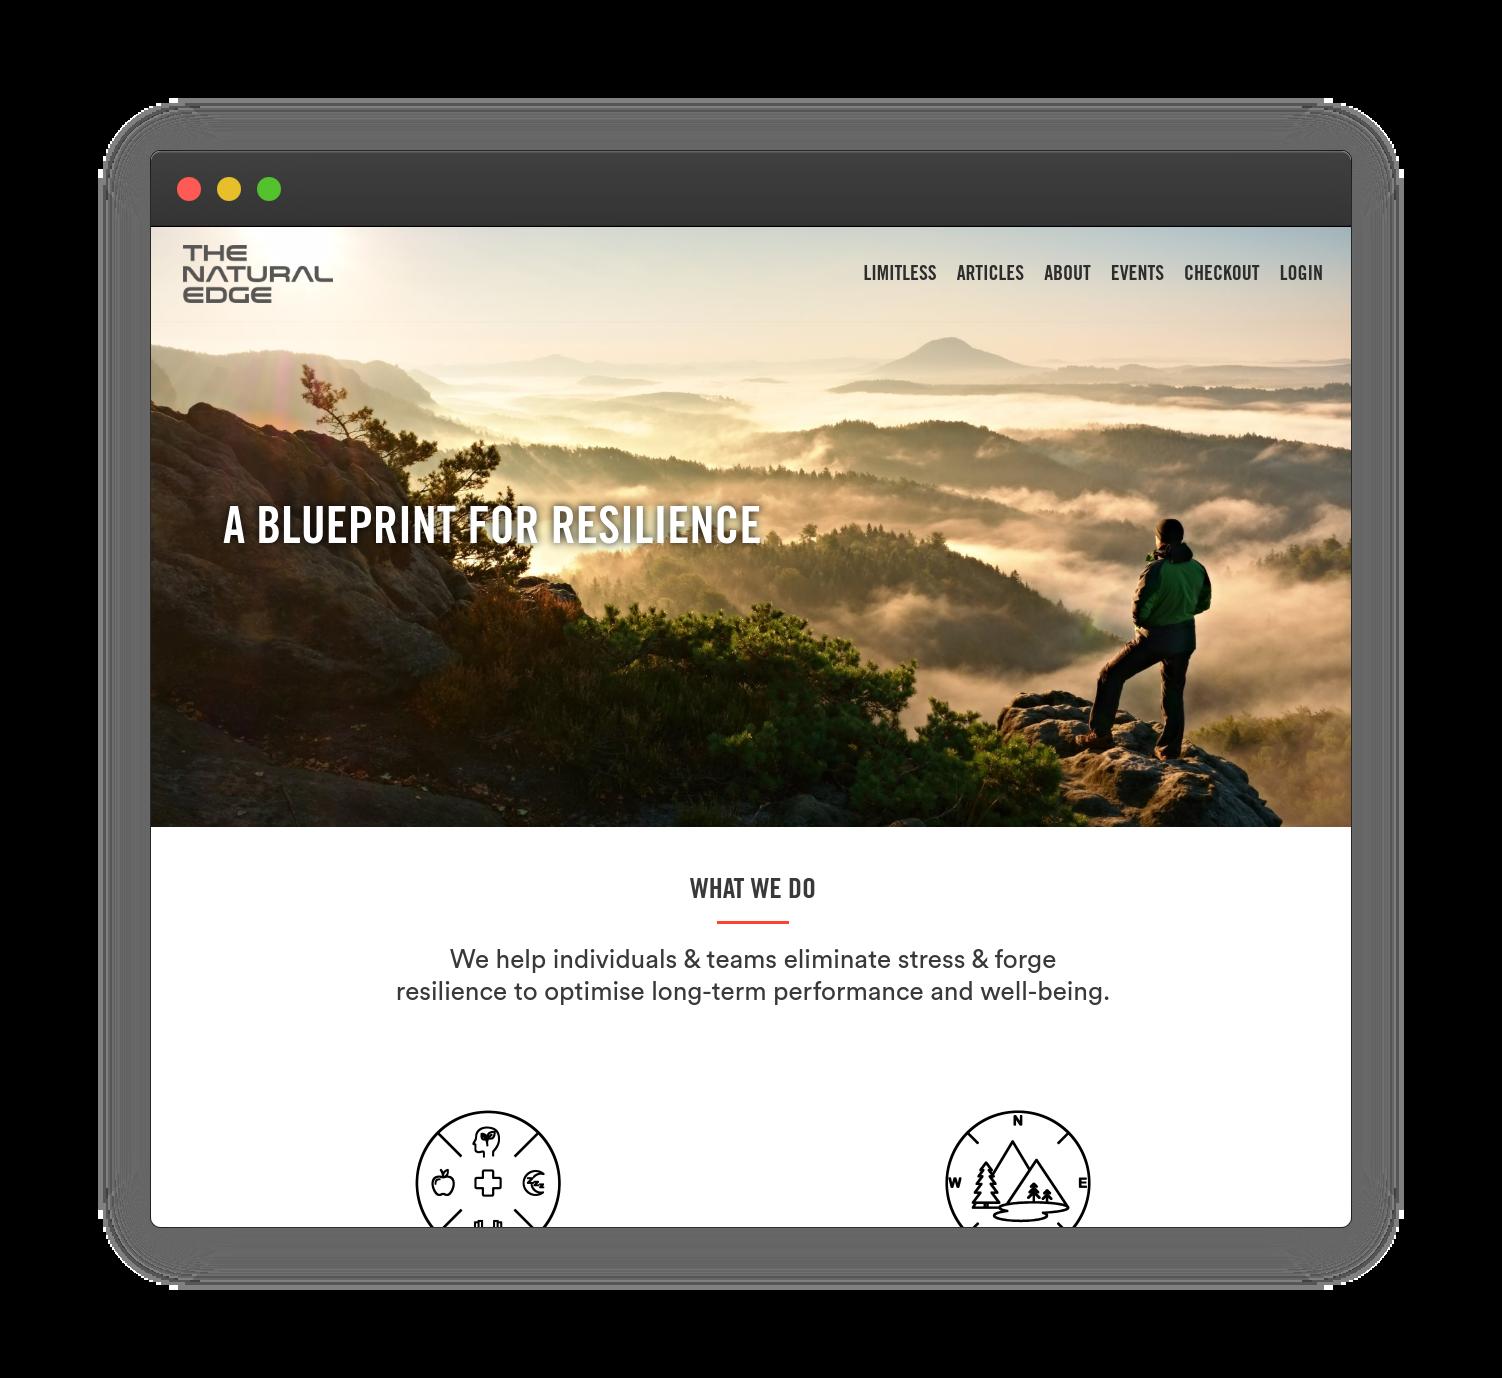 the natural edge - mpiricsoftware.com